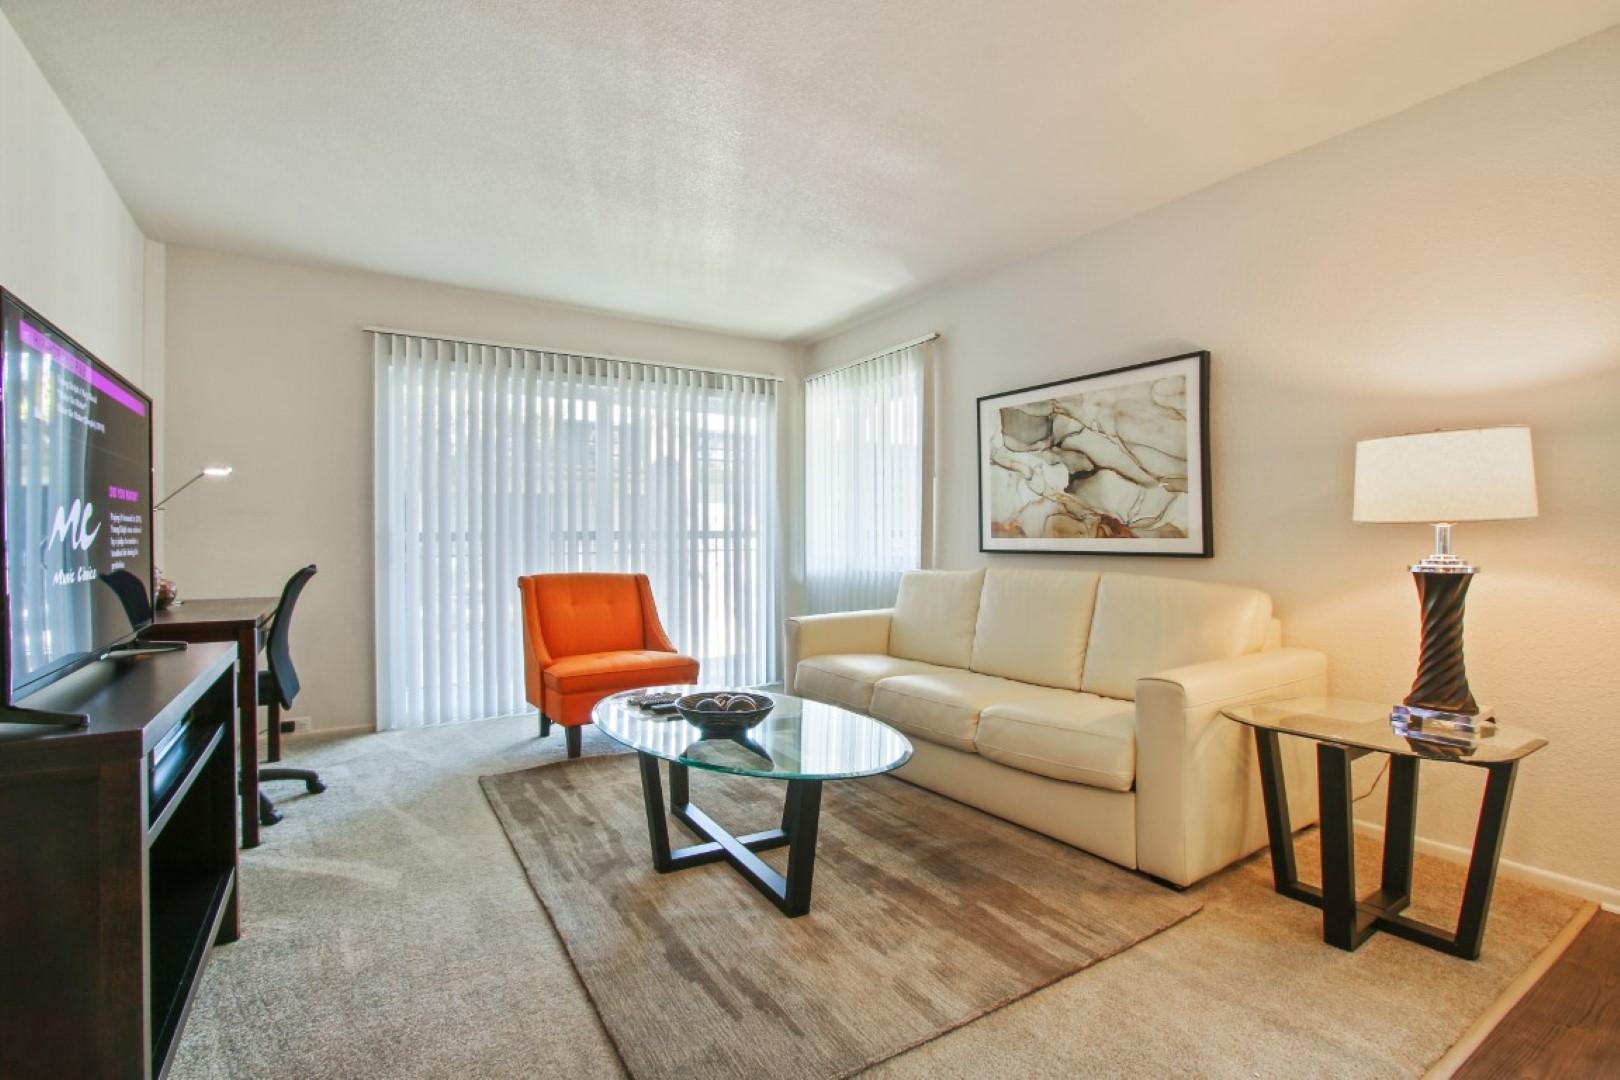 Sofa at Ava Toluca Hills Apartments, Toluca Lake, Los Angeles